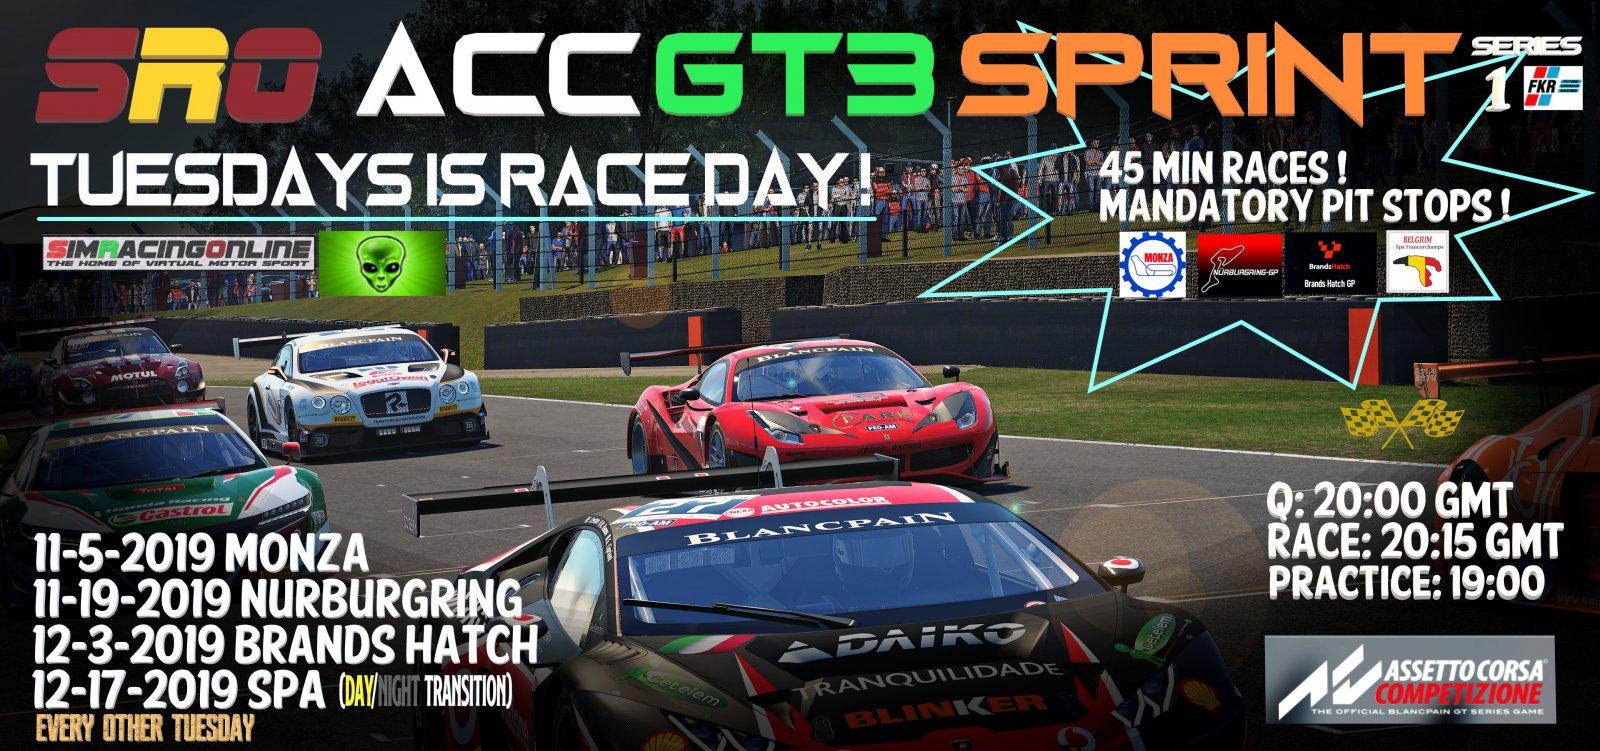 acc sprint 1.jpg